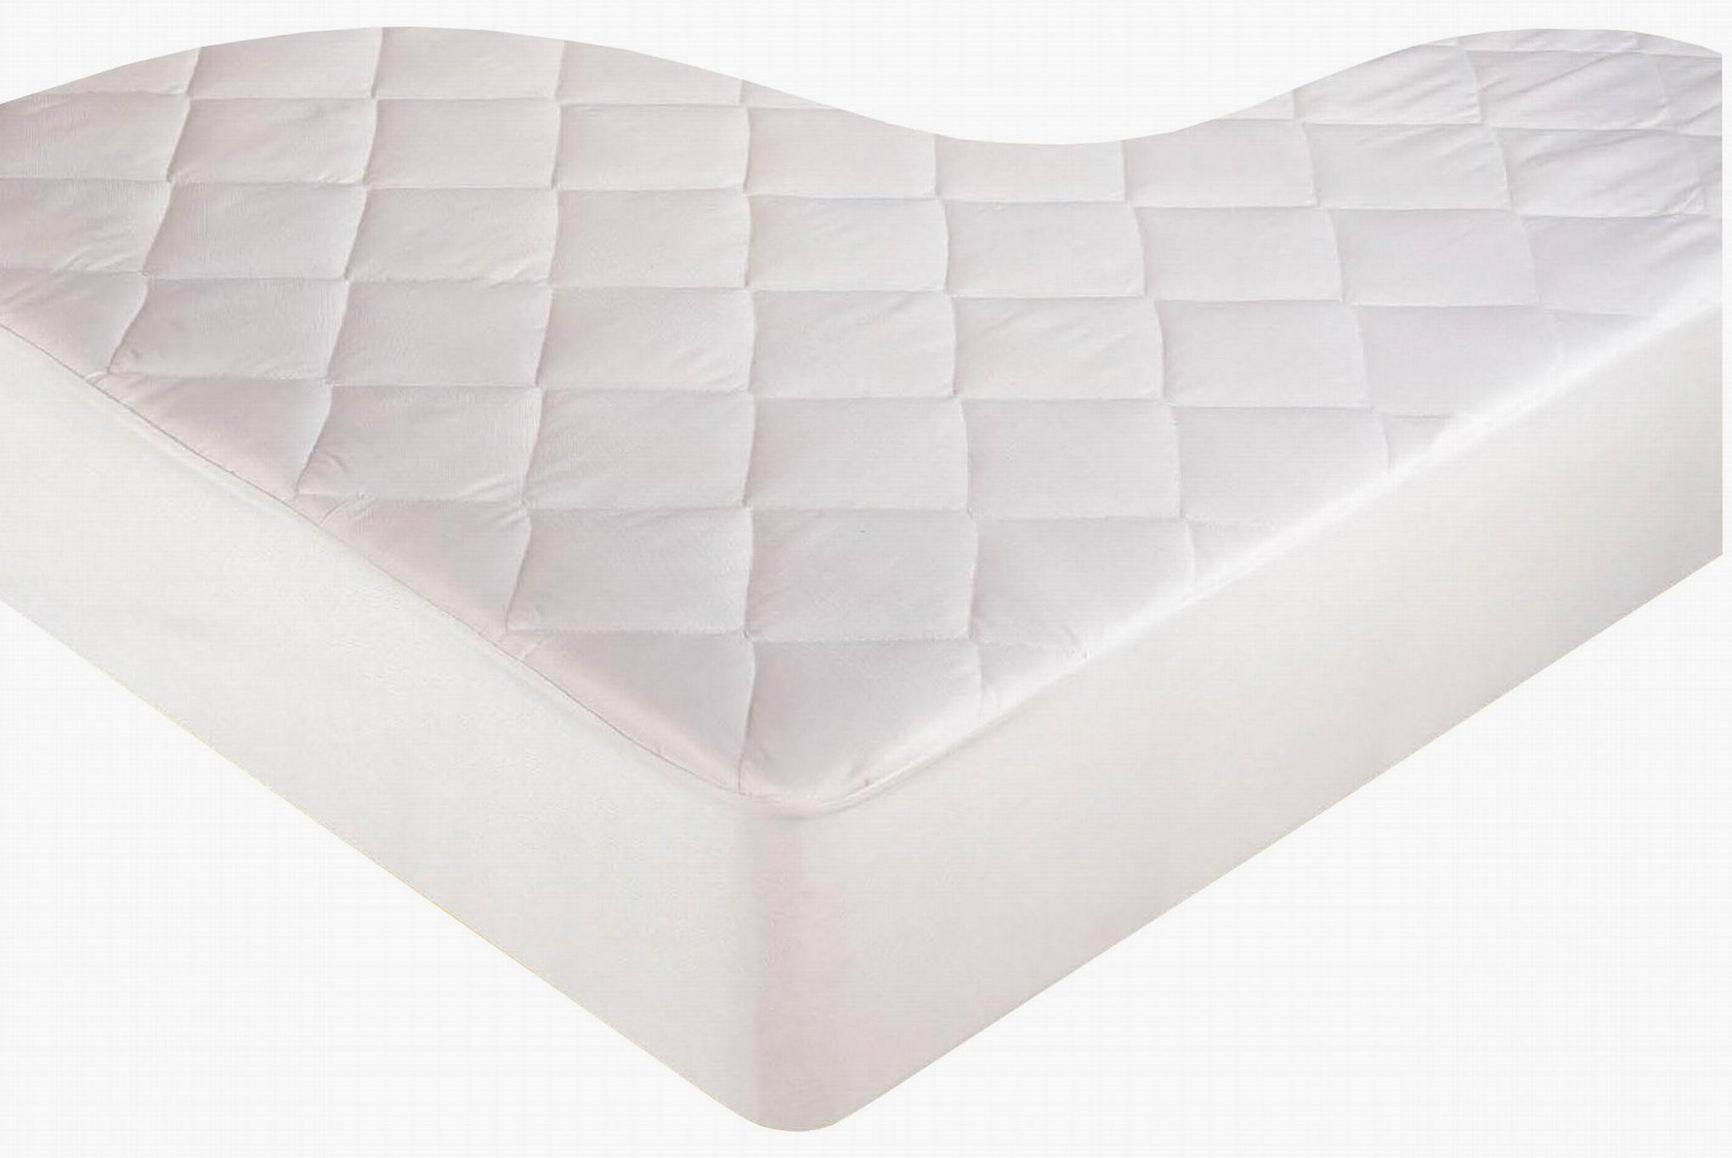 China Mattress Protector - China Mattress Protector, Bed Sheets